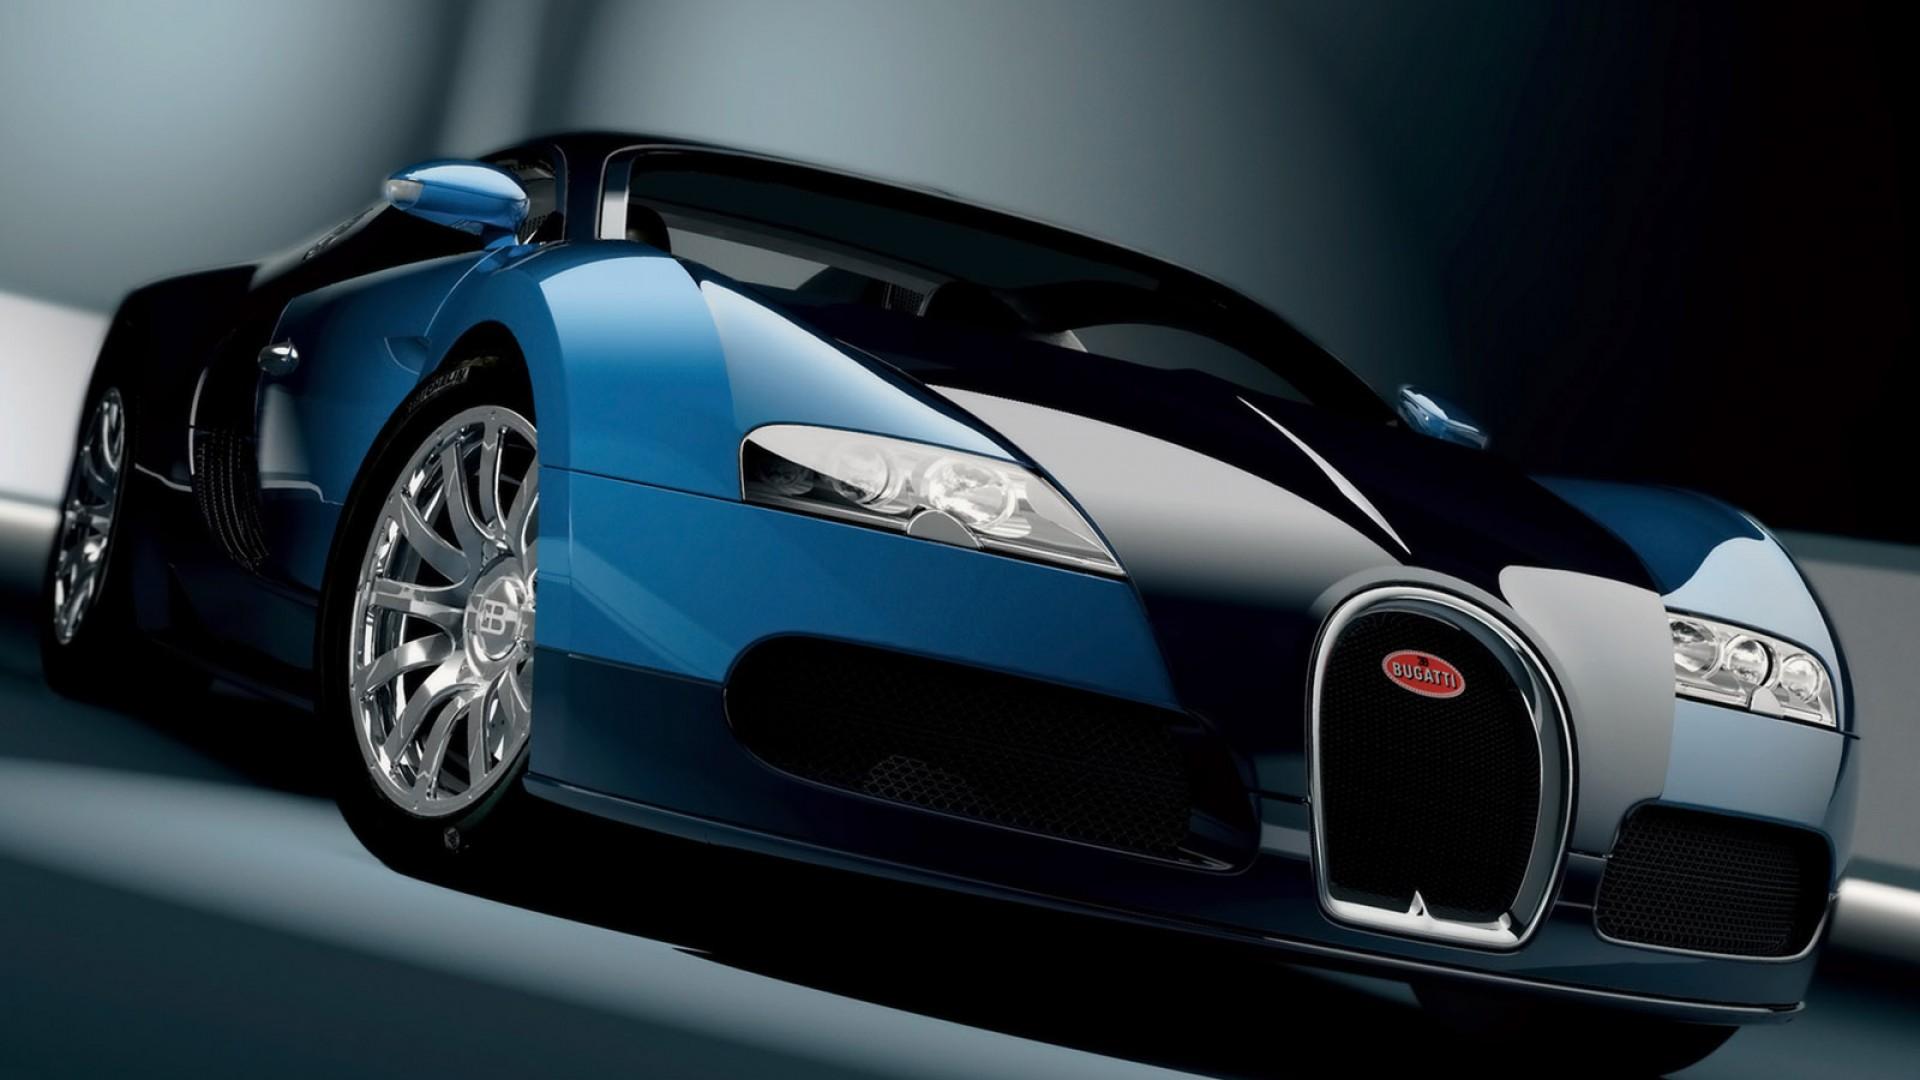 Bugatti-black-hd-background-Black-And-Blue-Hd-Black-And-Blue-Hd-wallpaper-wp3603739